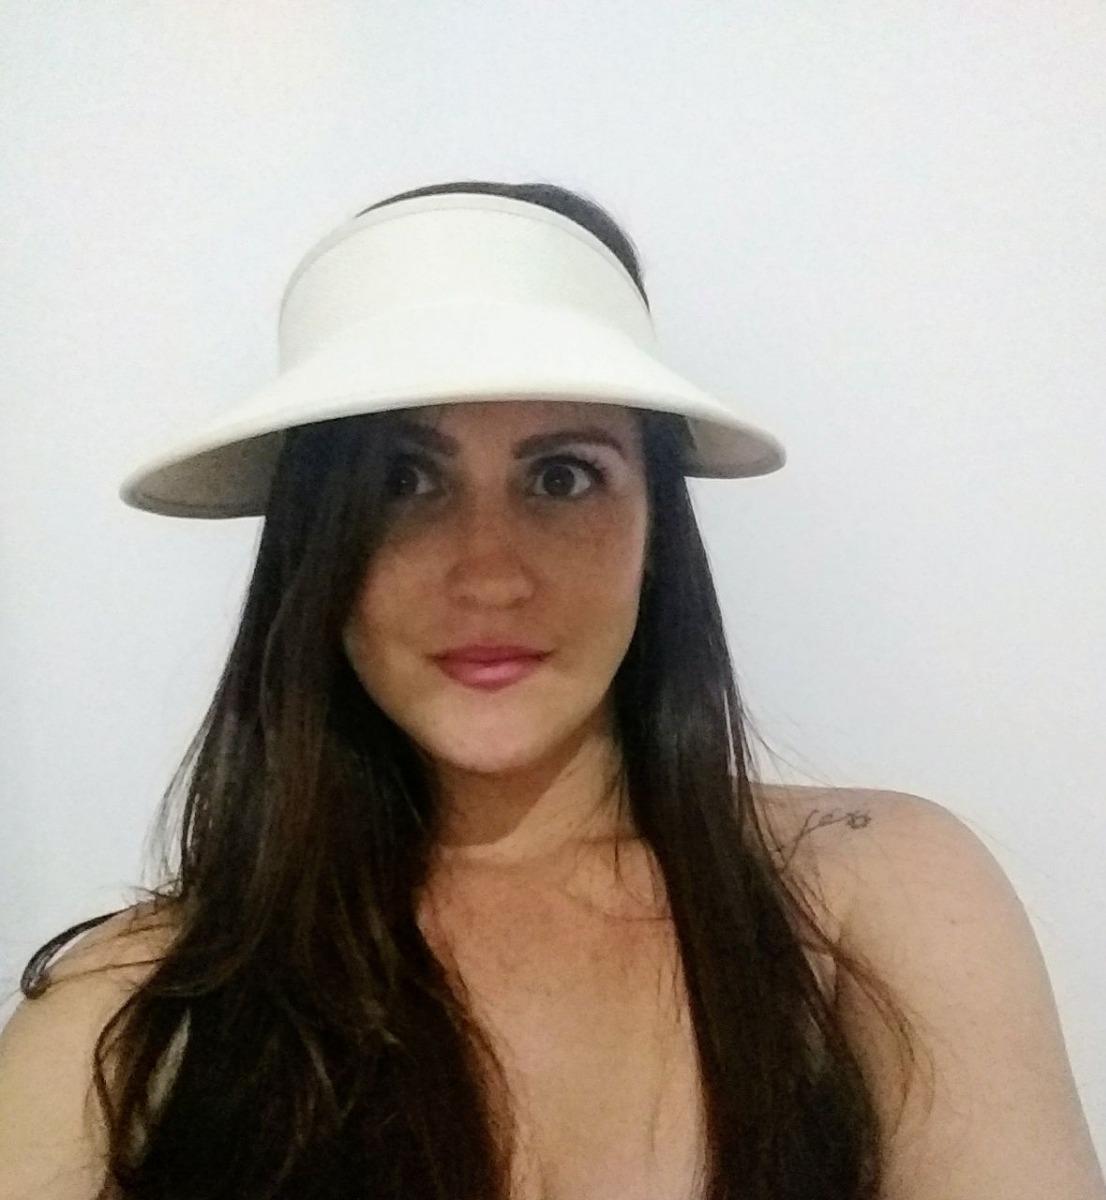 chapeu de praia feminino palha sol mar praia 2018 barato. Carregando zoom. 4b3eaa0e97b